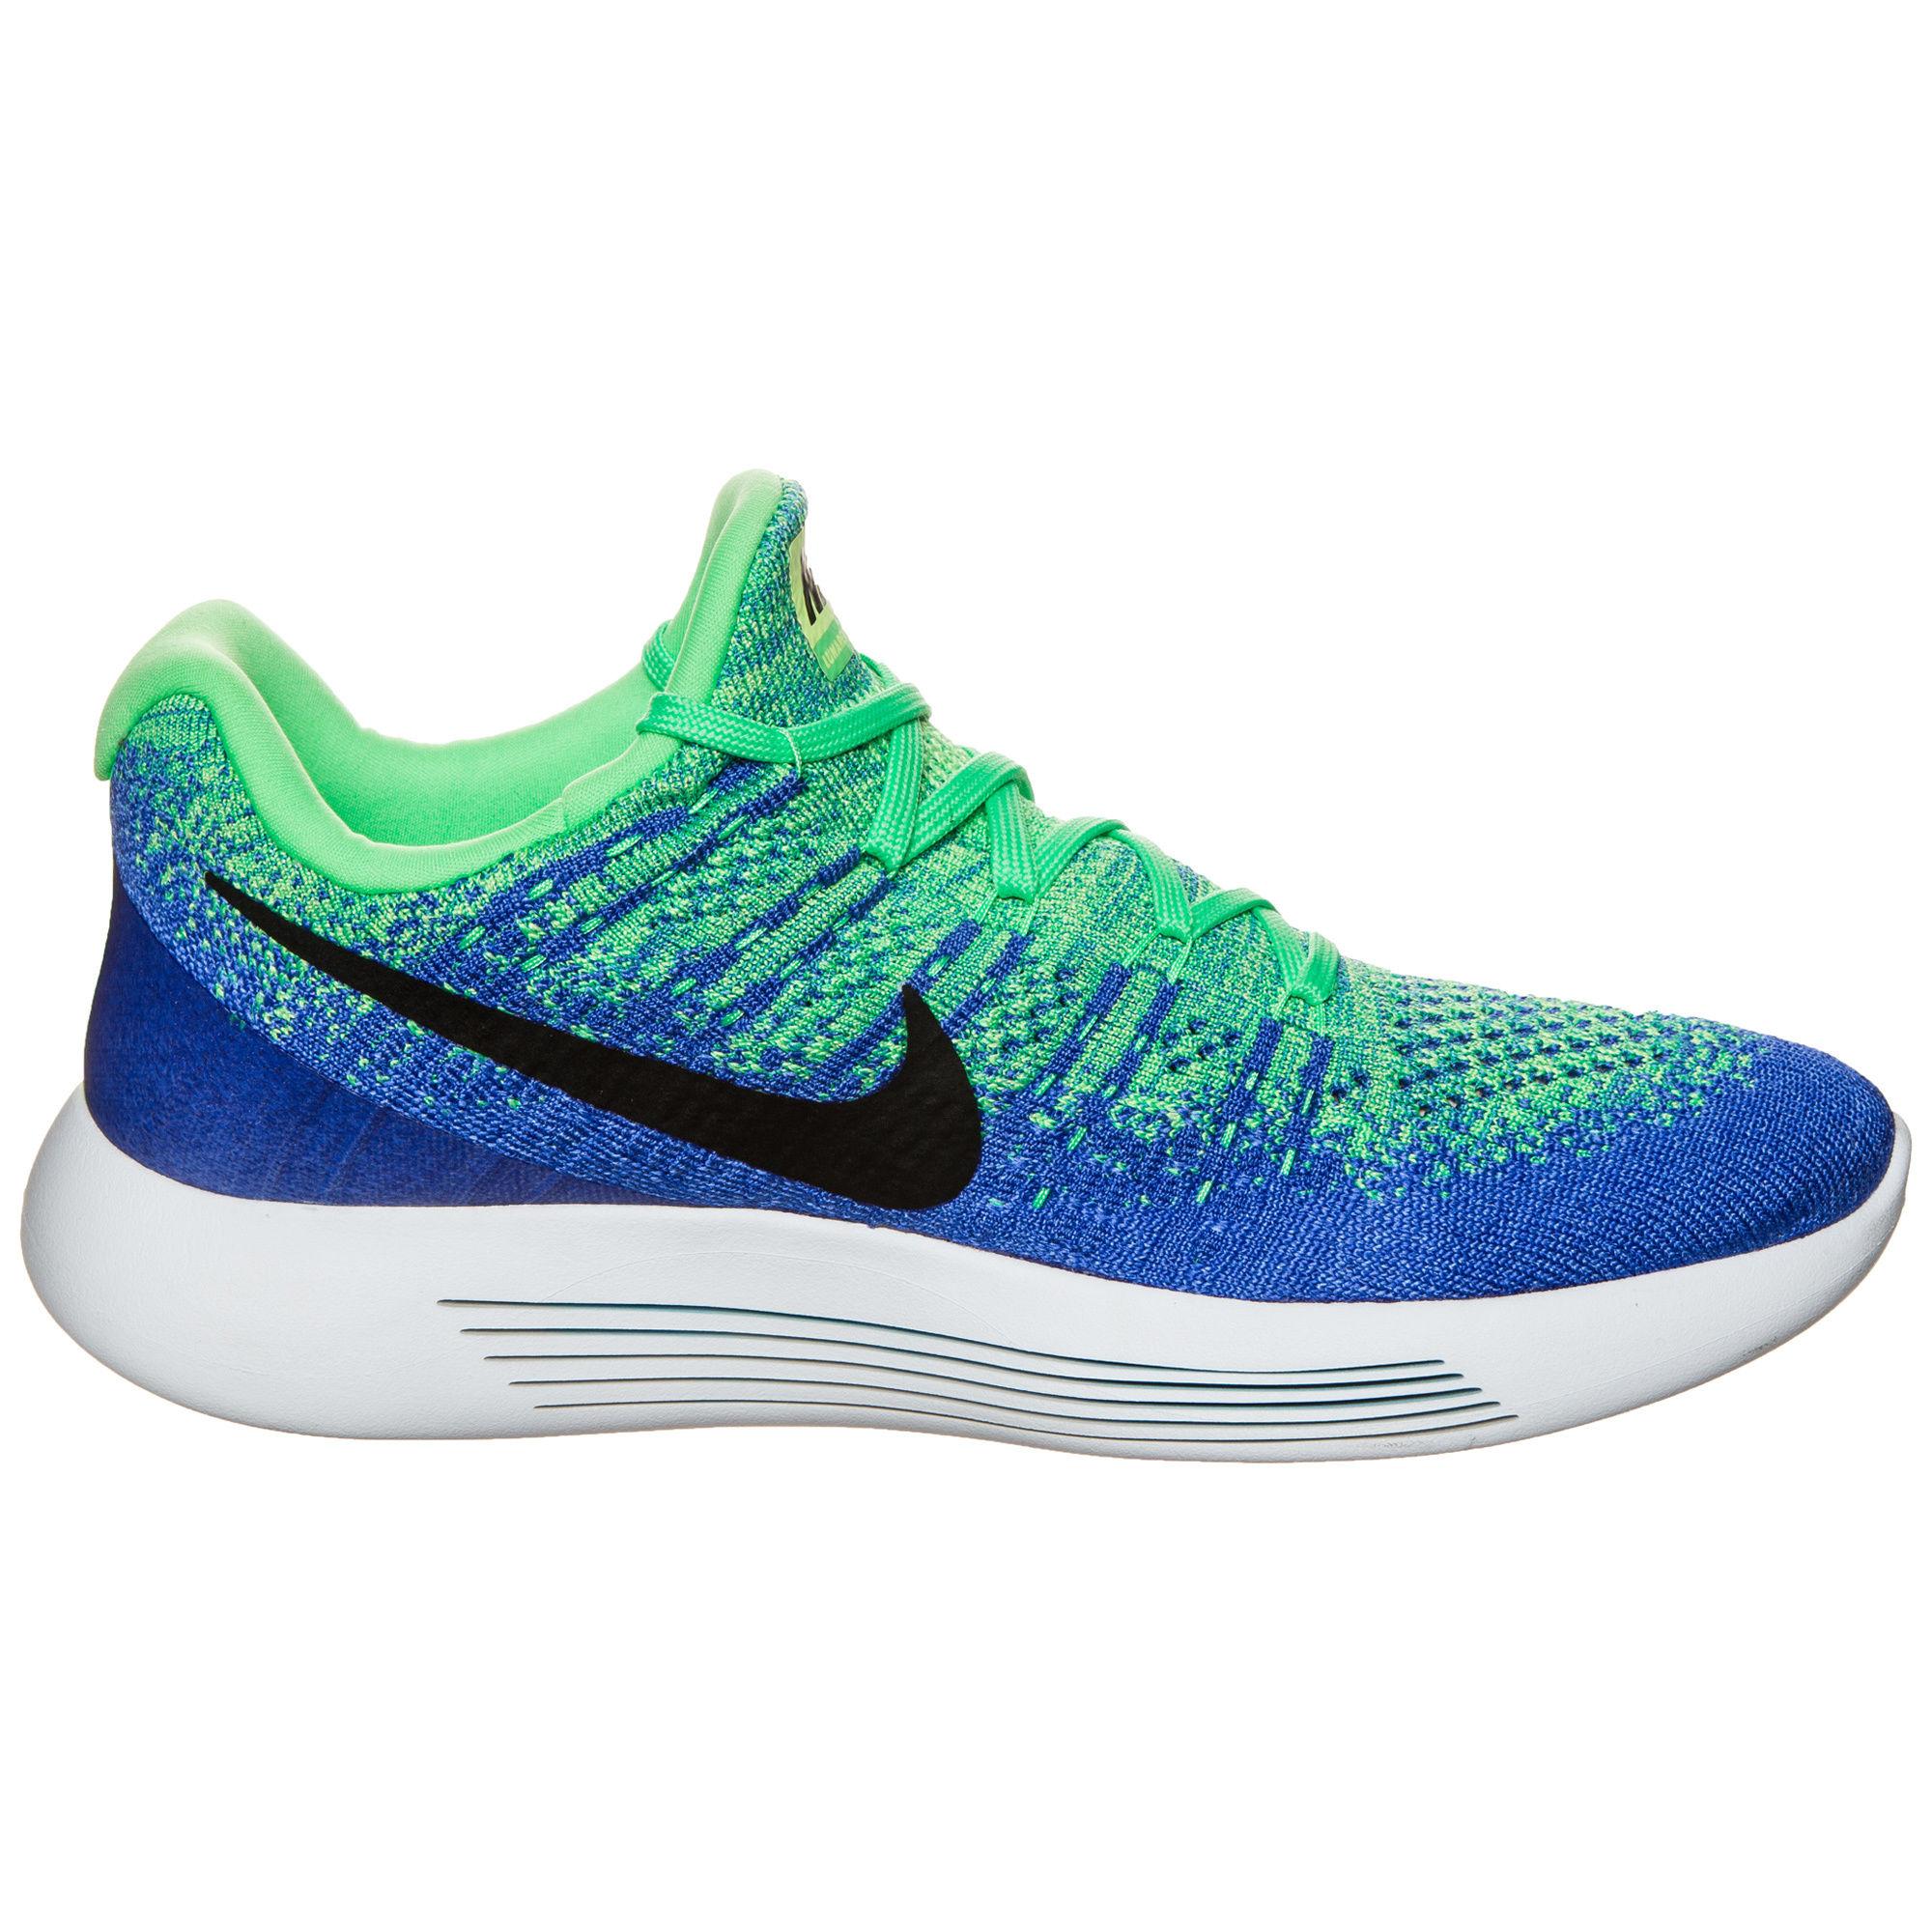 Nike LunarEpic Low Flyknit 2 in Grün Blau